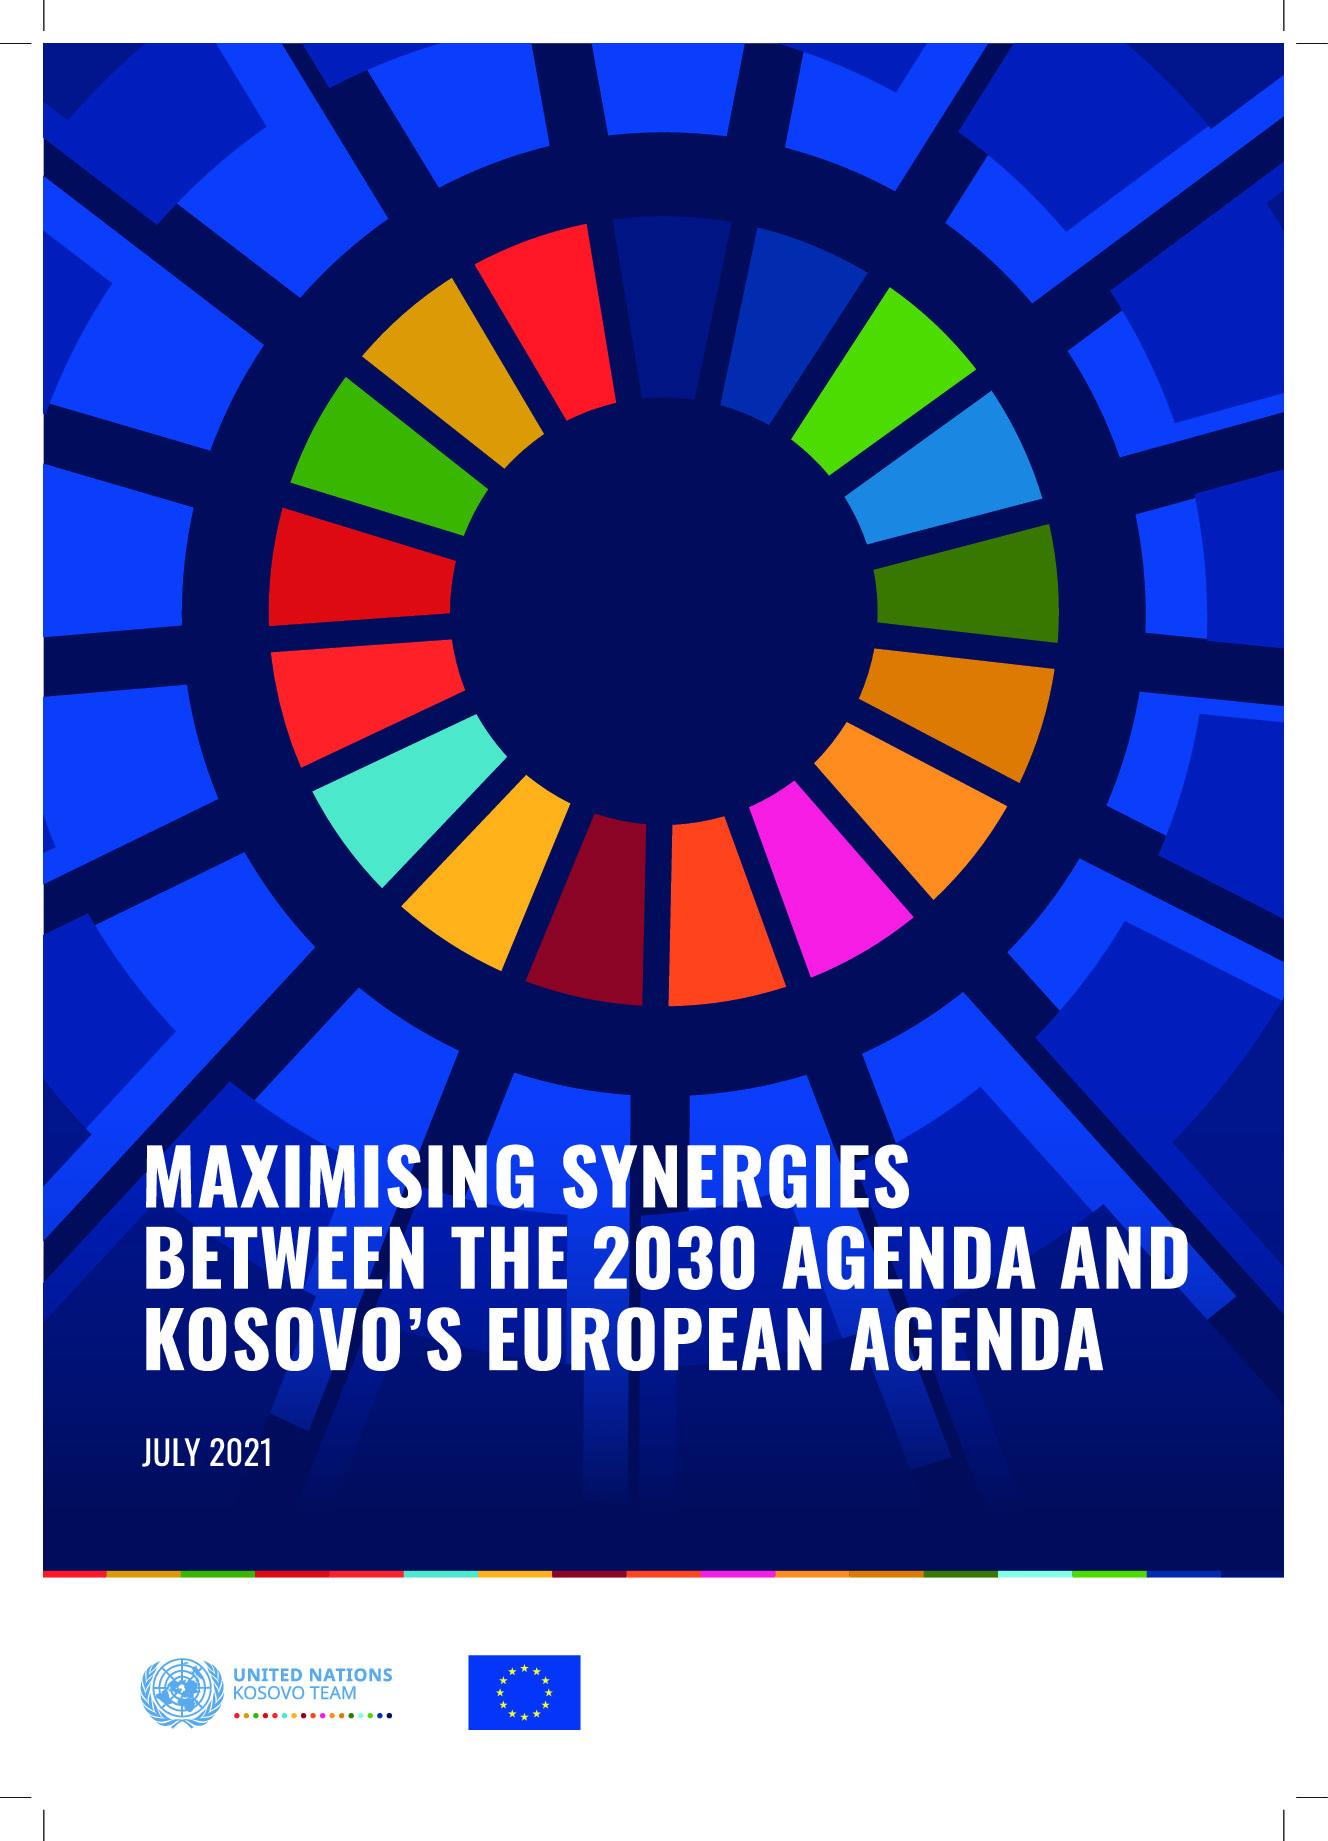 Maximising Synergies Between the 2030 Agenda and Kosovo's European Agenda